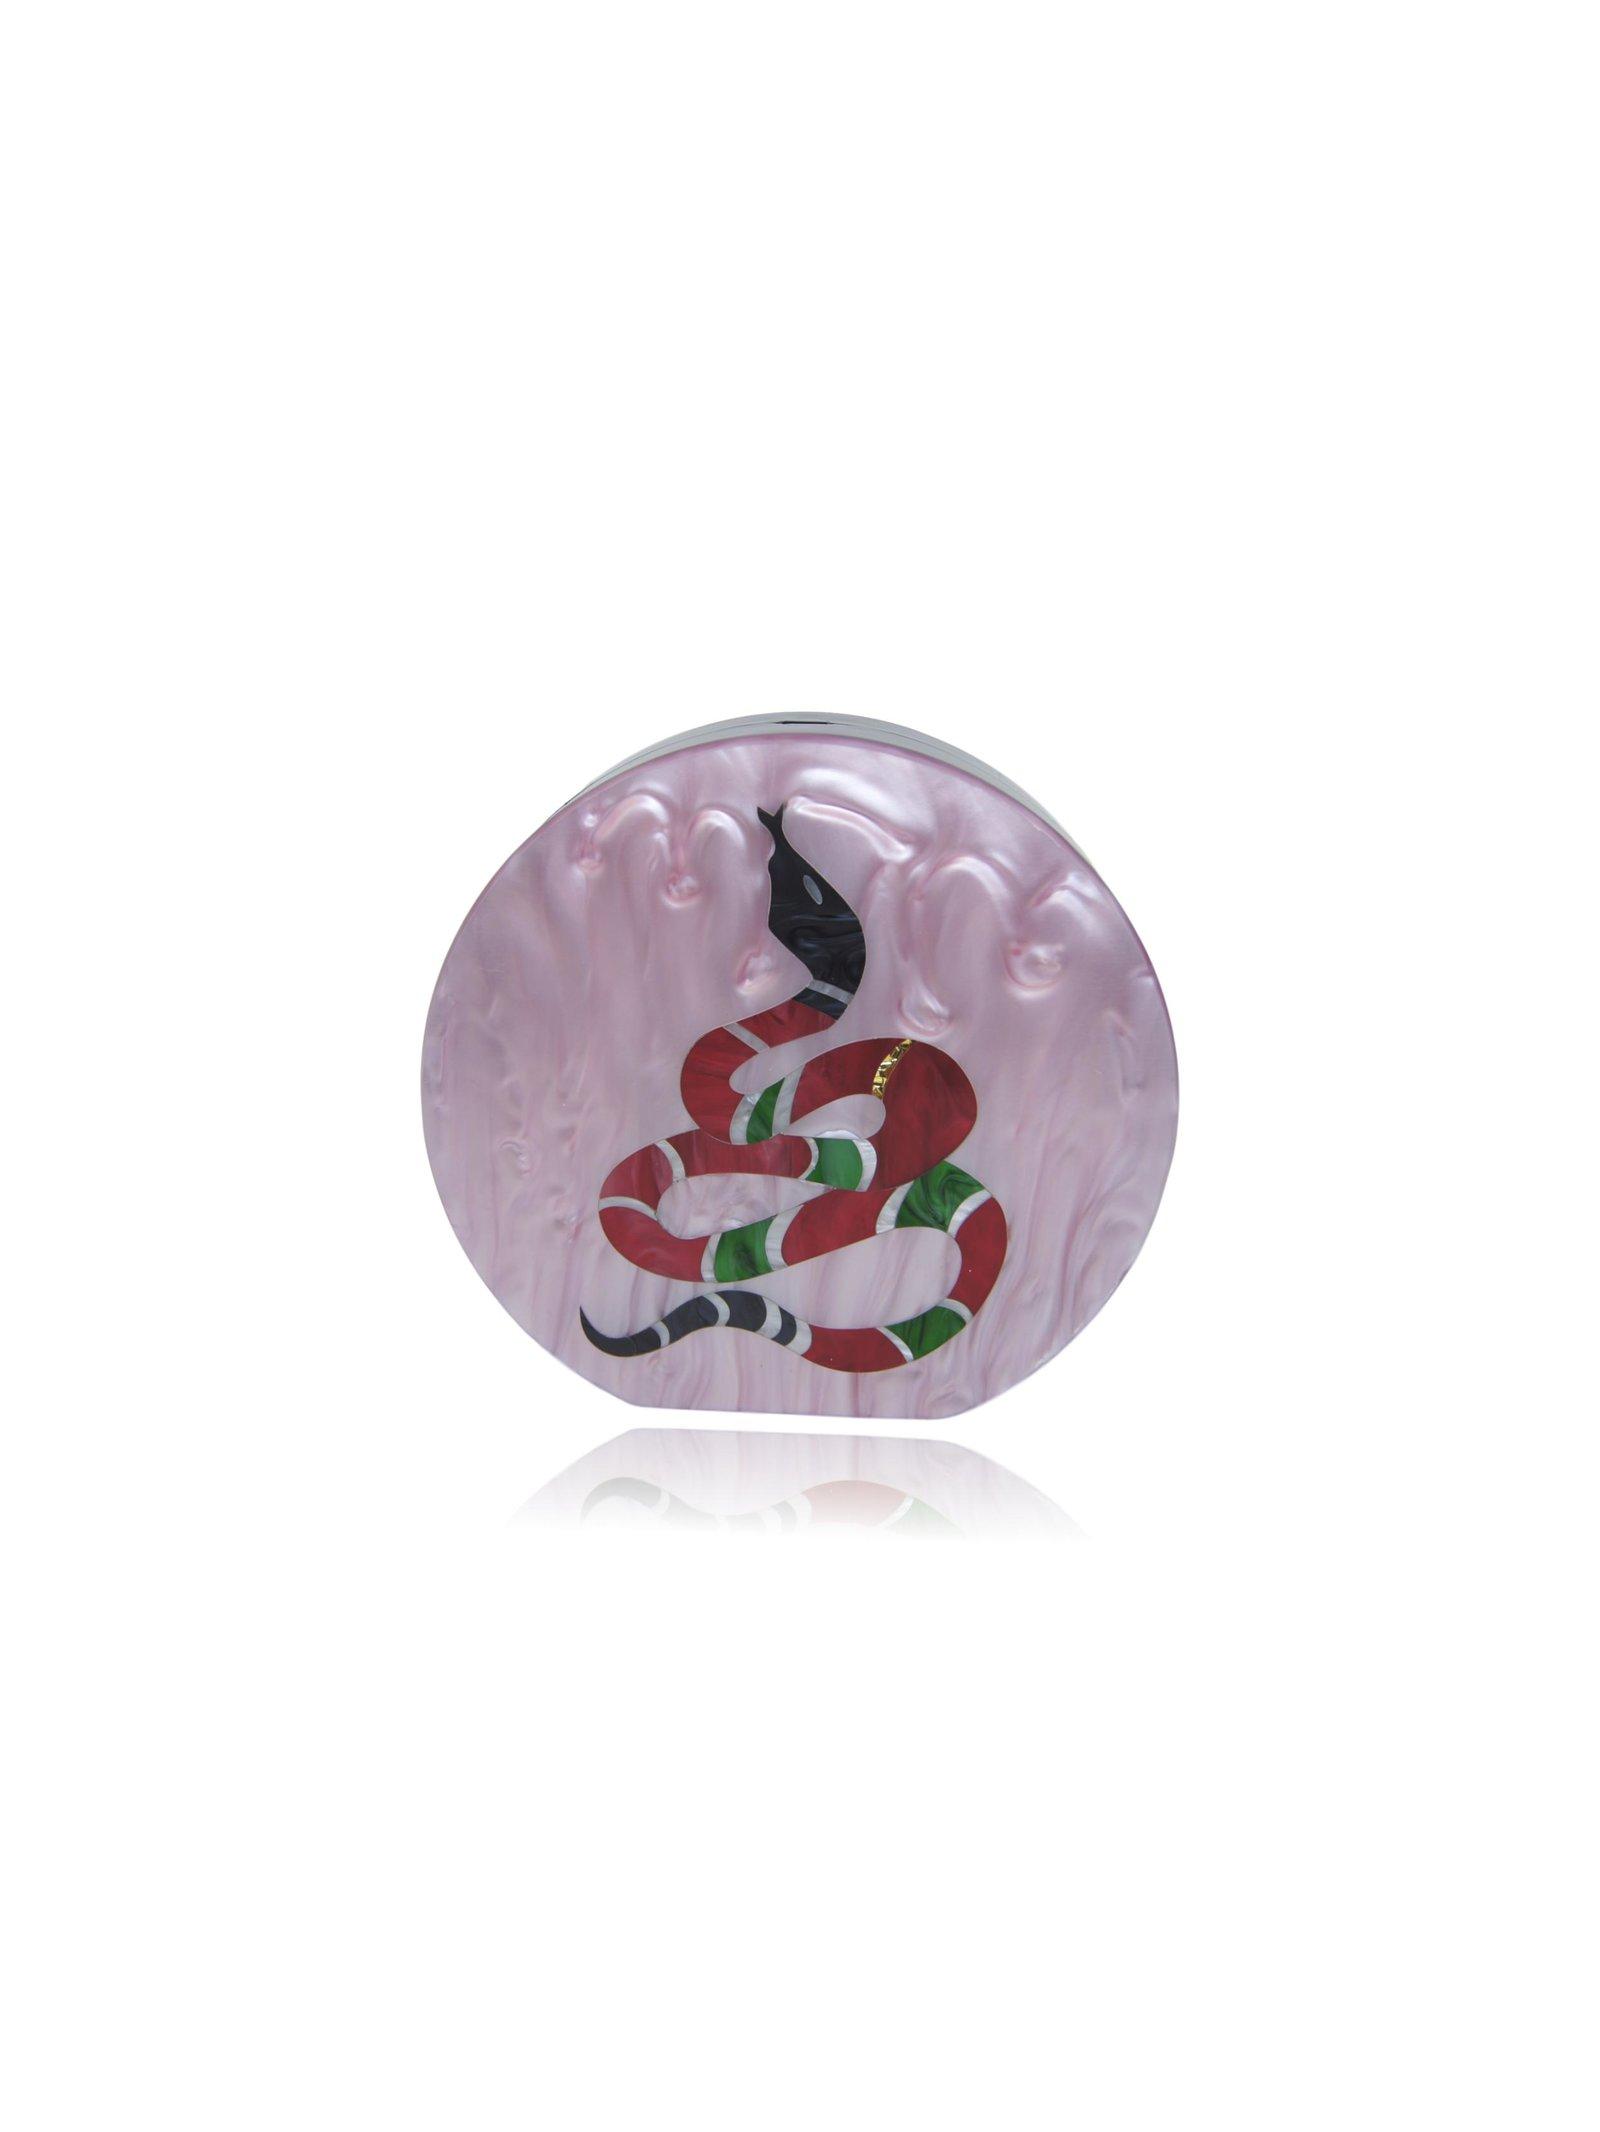 Milanblocks Blush Pink Snake Half-Round Acrylic Clutch